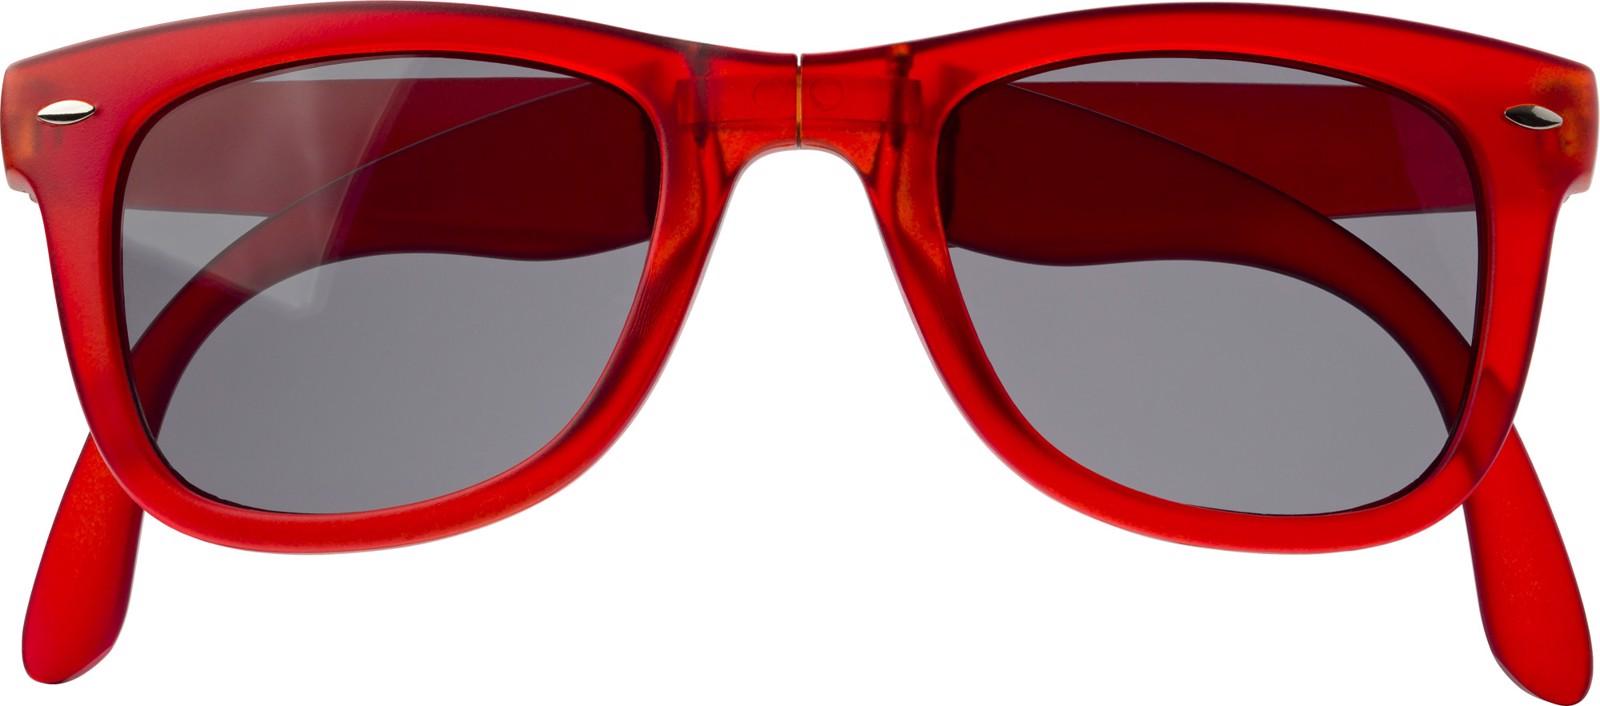 Foldable sunglasses.